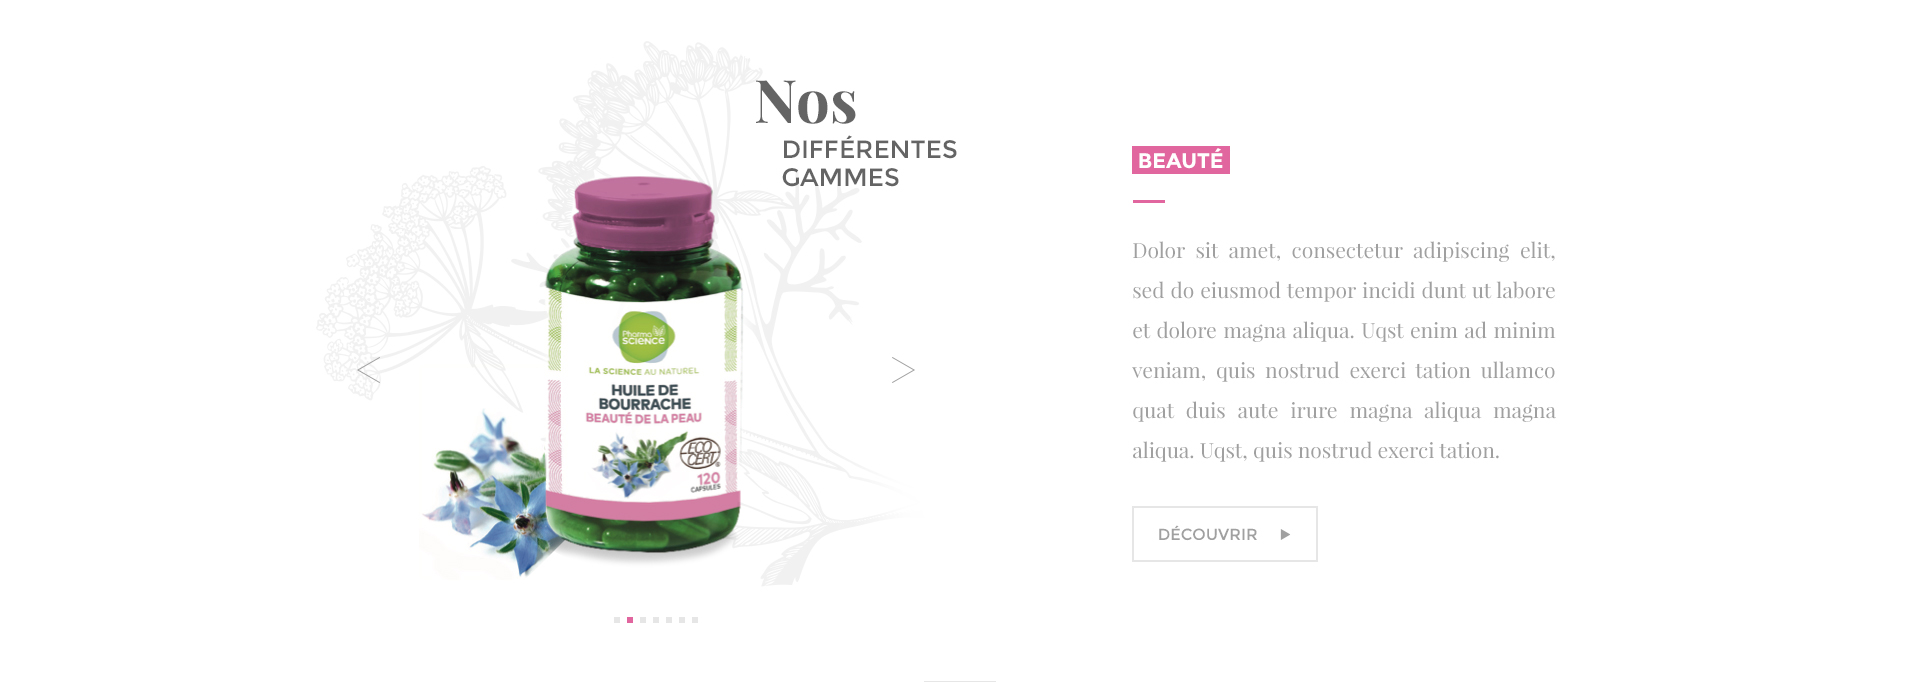 nos_differentes_gammes